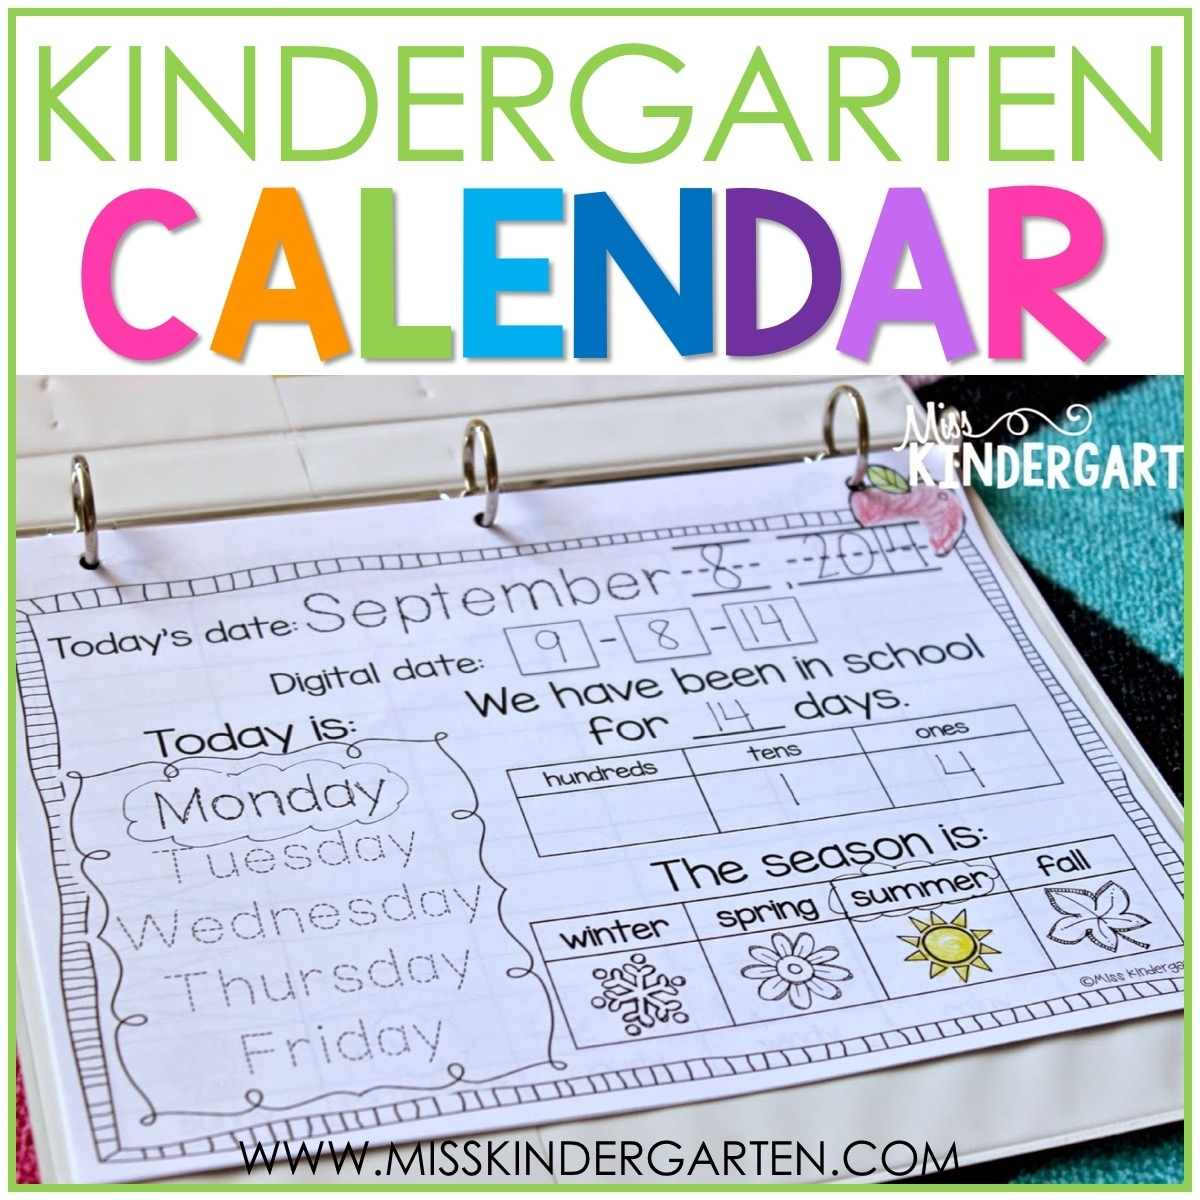 Calendar Time In Kindergarten - Miss Kindergarten November Calendar Template Kindergarten